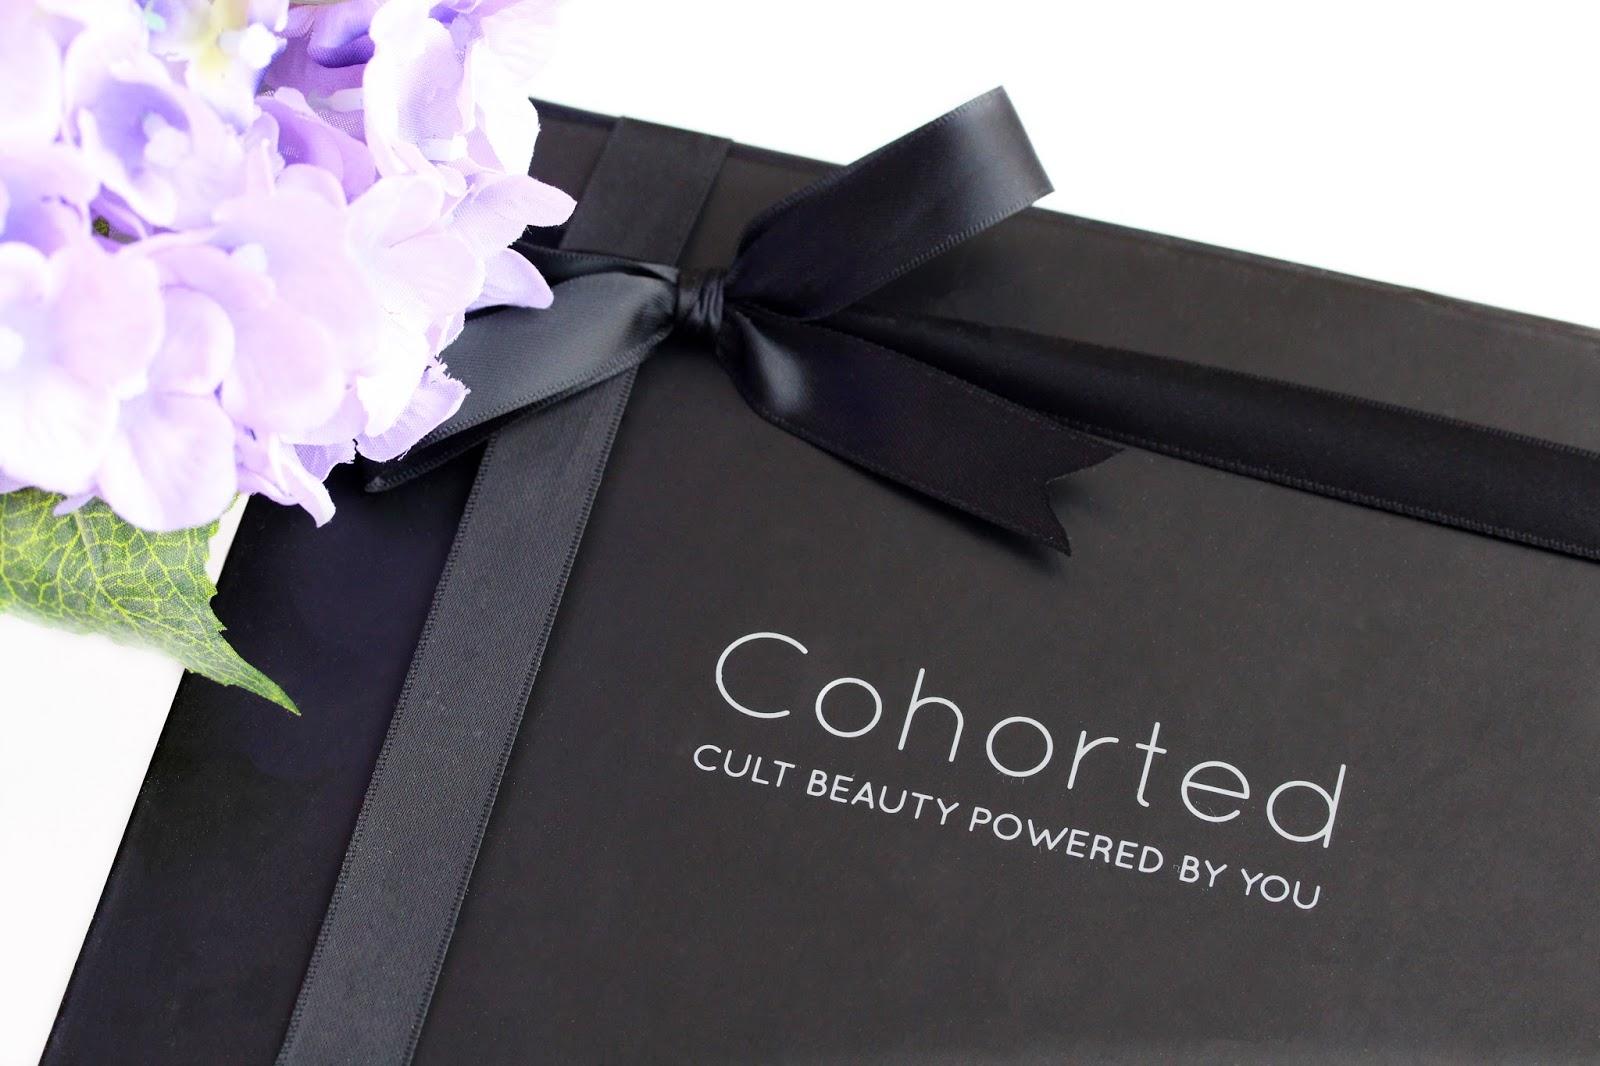 Cohorted Beauty Box